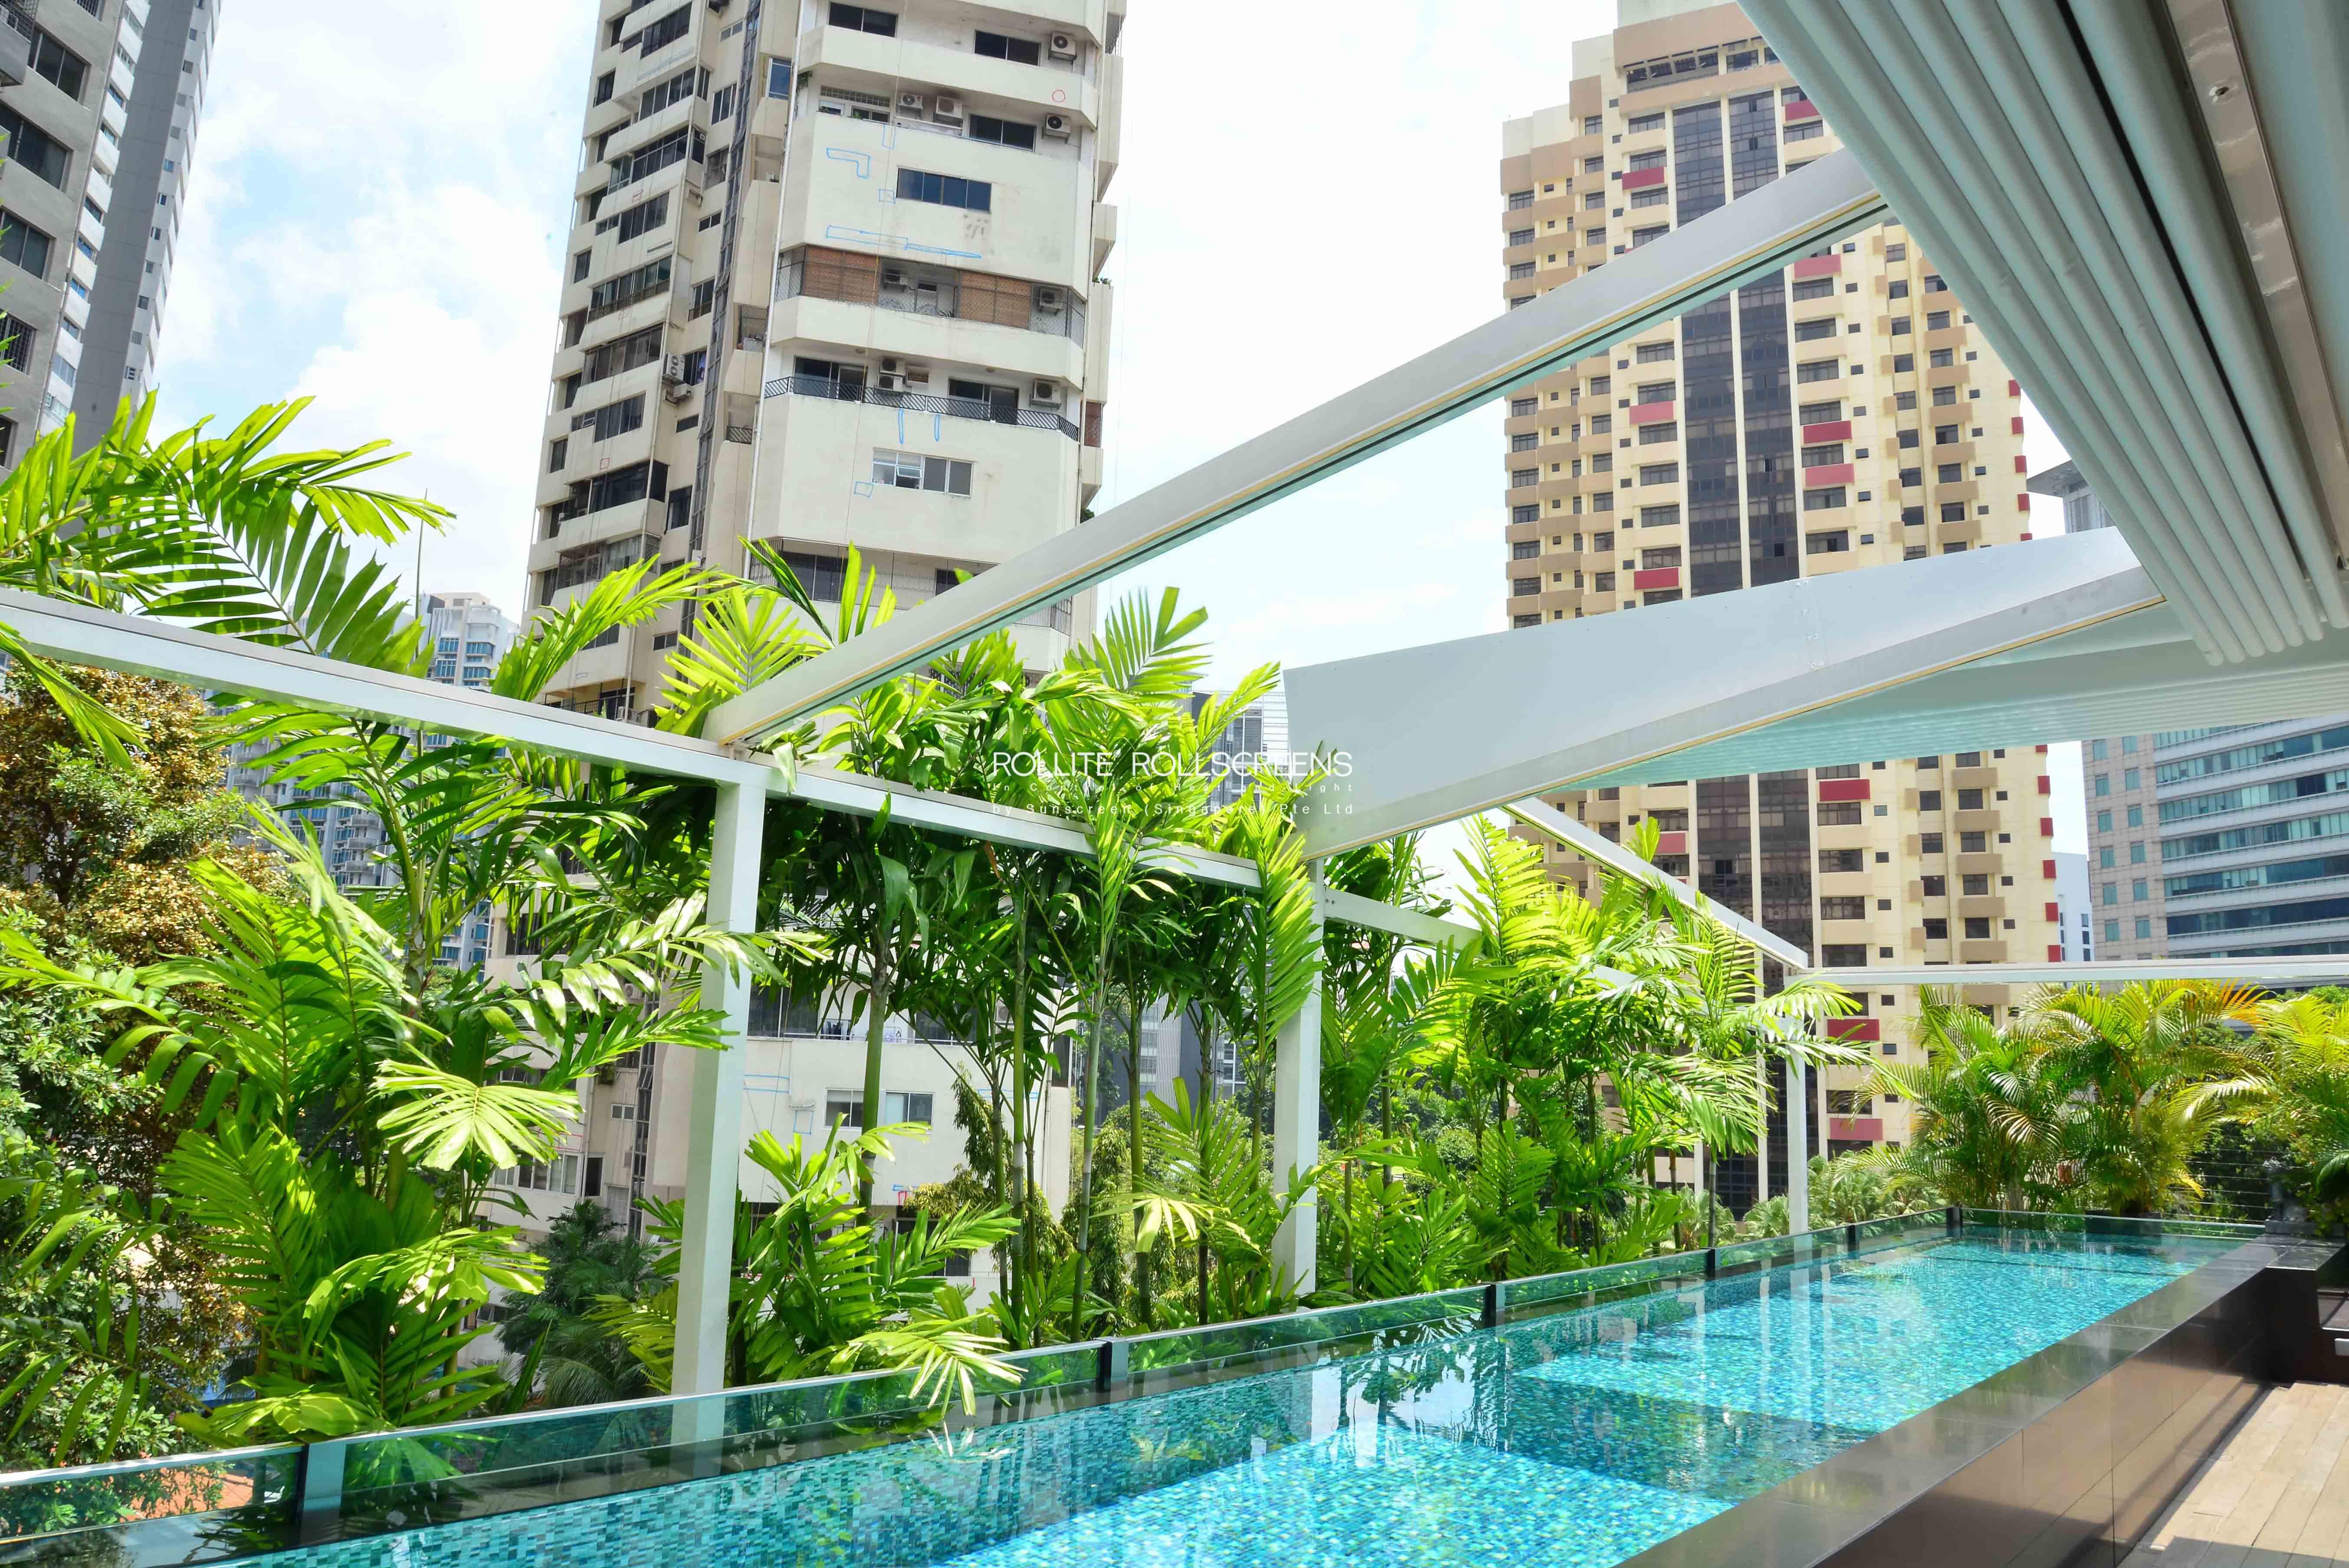 Sunscreen Singapore_Rollite Outdoor 36